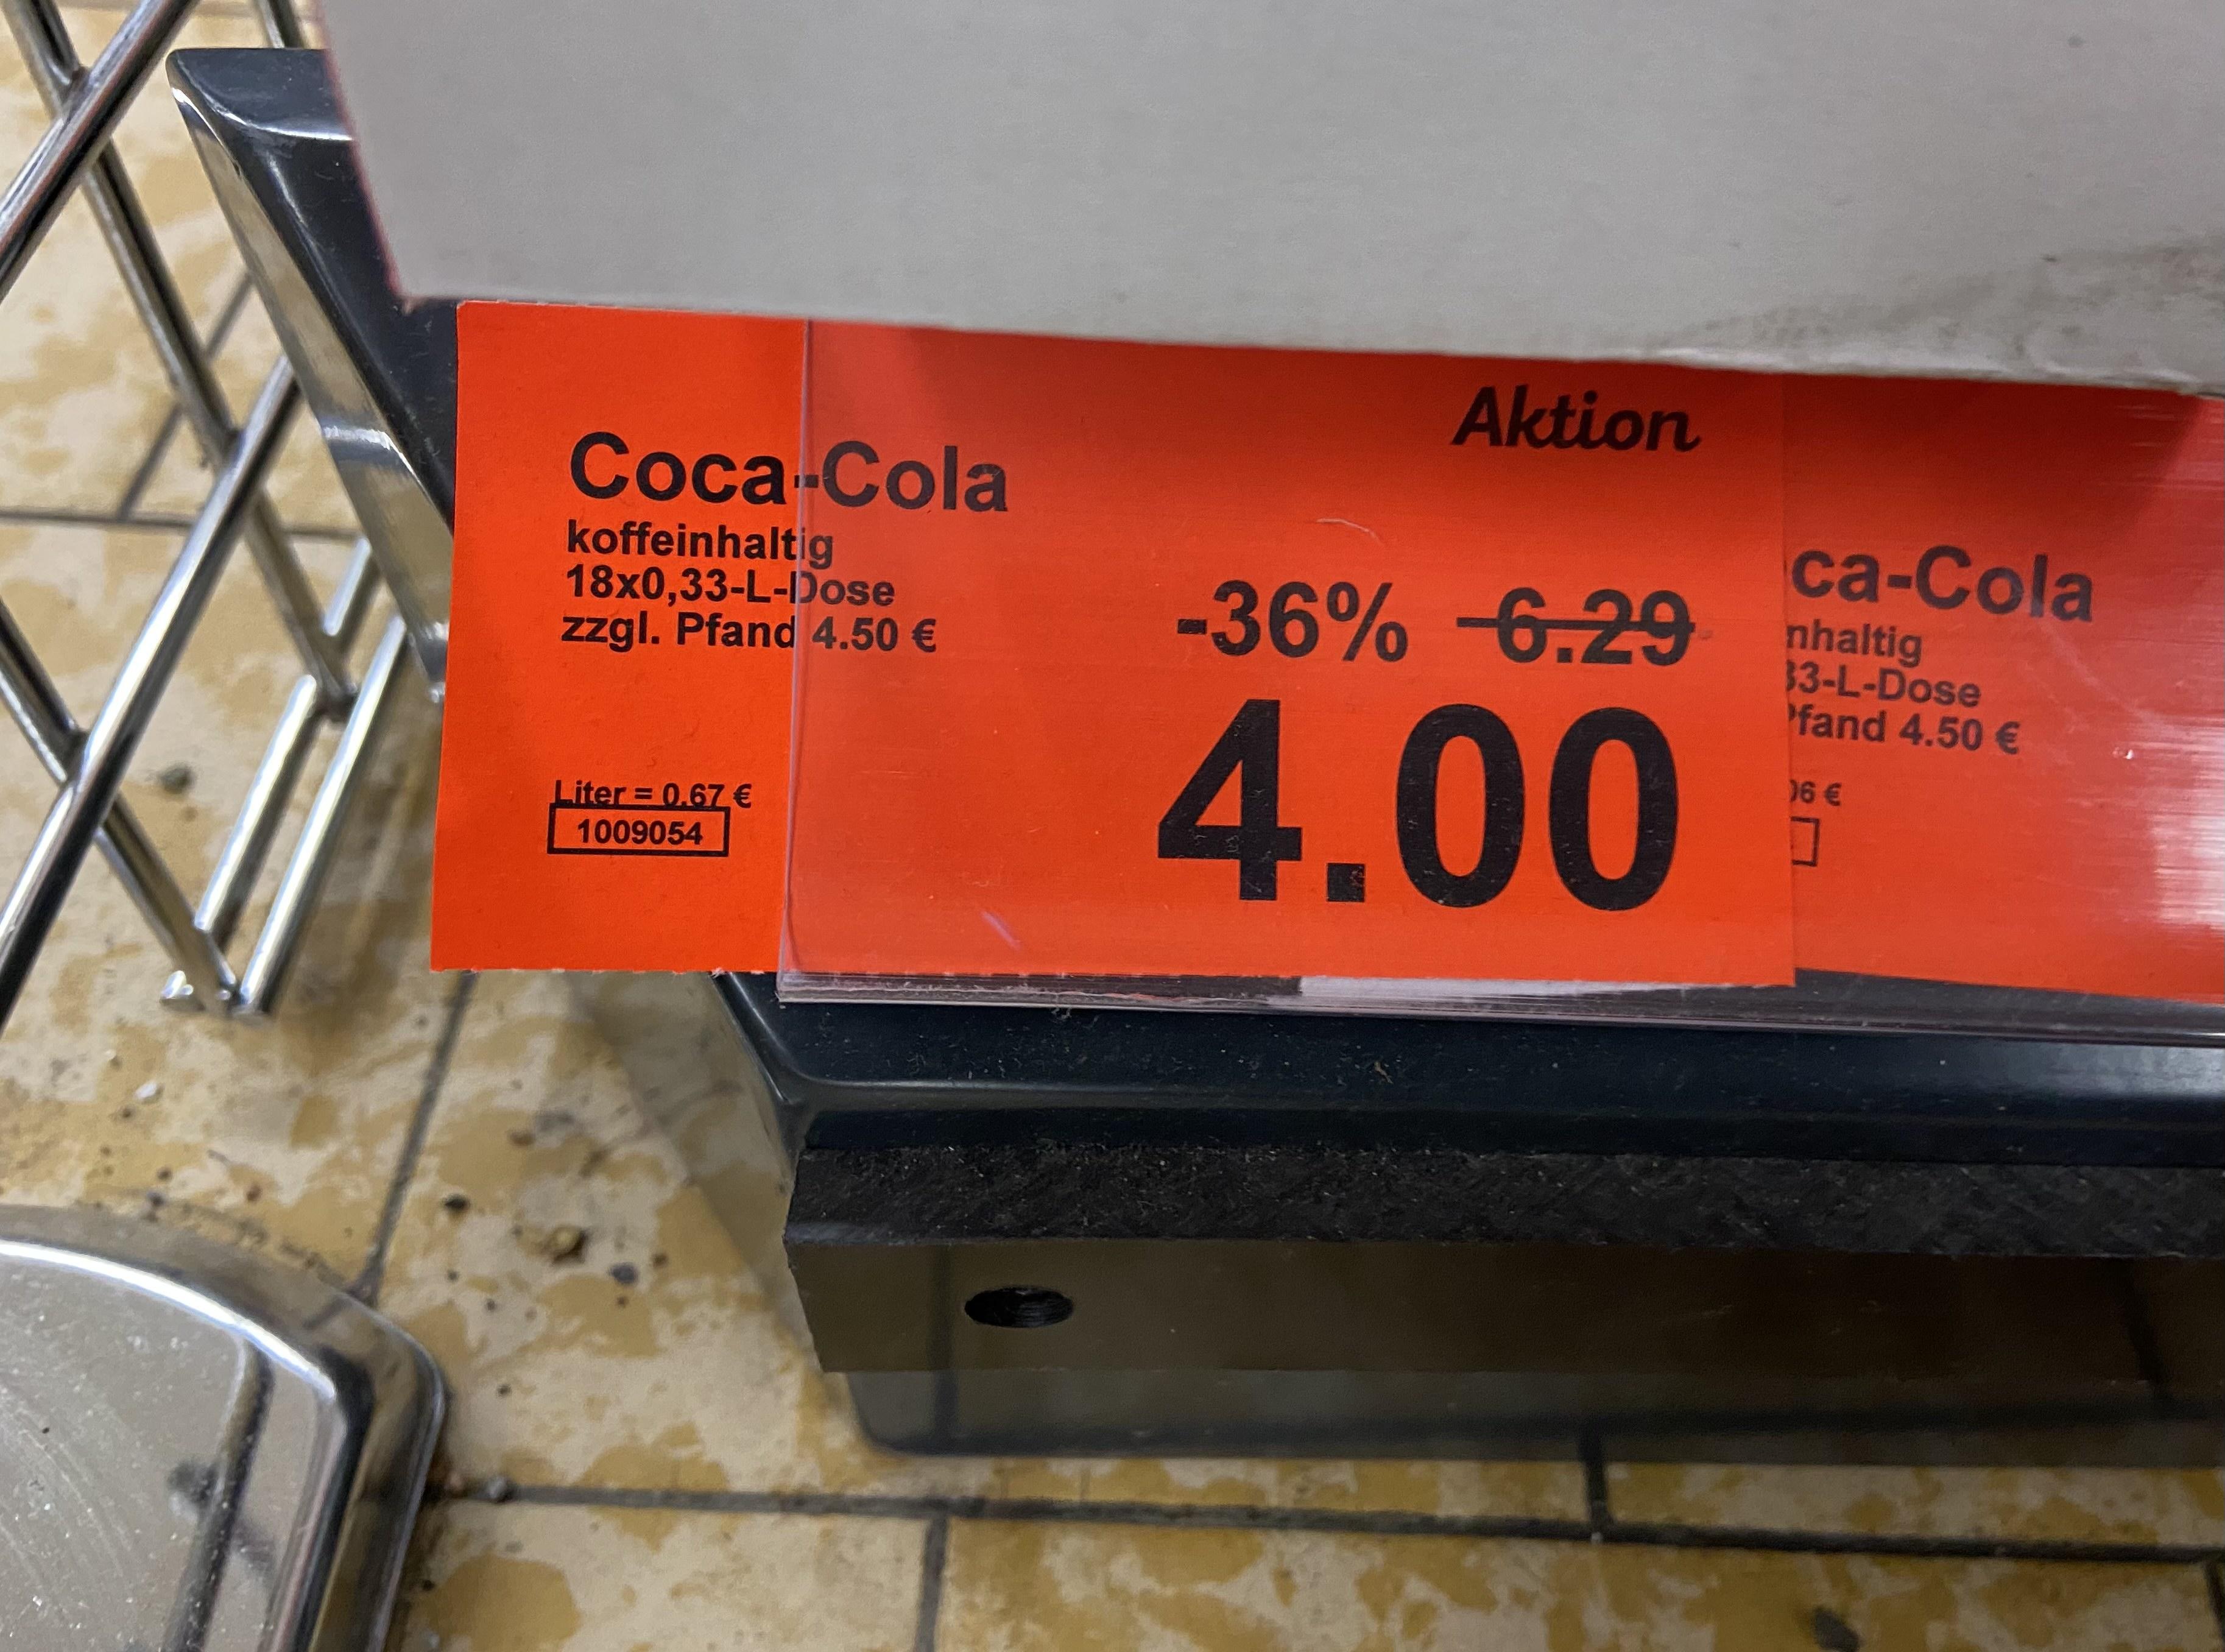 Aldi-Nord (Lokal) | Coca-Cola XXL-Pack 18x 0,33l Dose